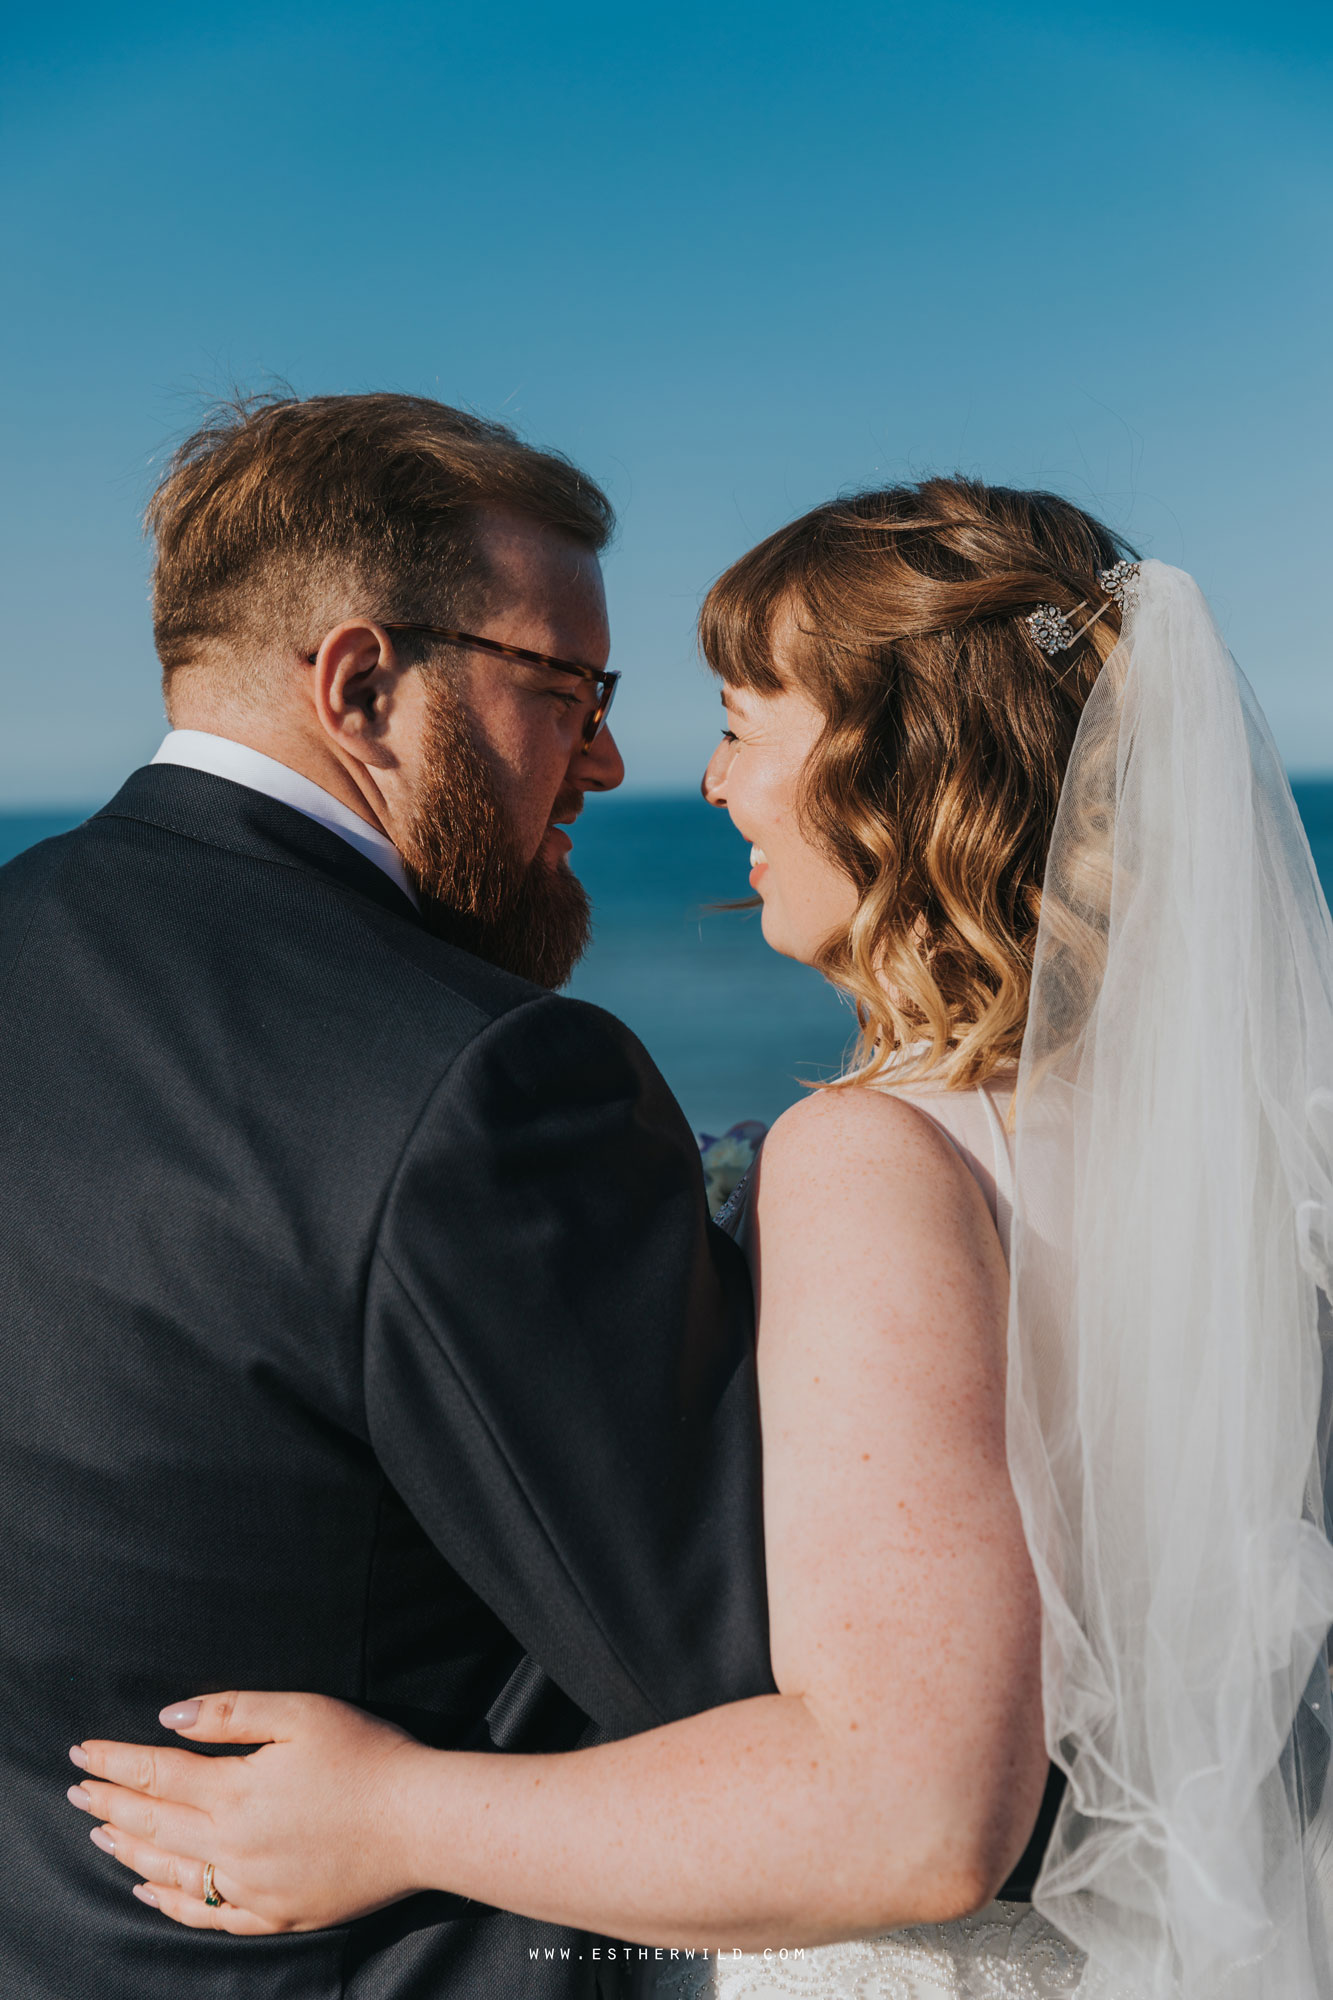 Cromer_Wedding_Beach_Outdoor_Ceremony_Norfolk_North_Lodge_Registry_Office_Rocket_House_Cafe_Cromer_Pier_IMG_4525.jpg